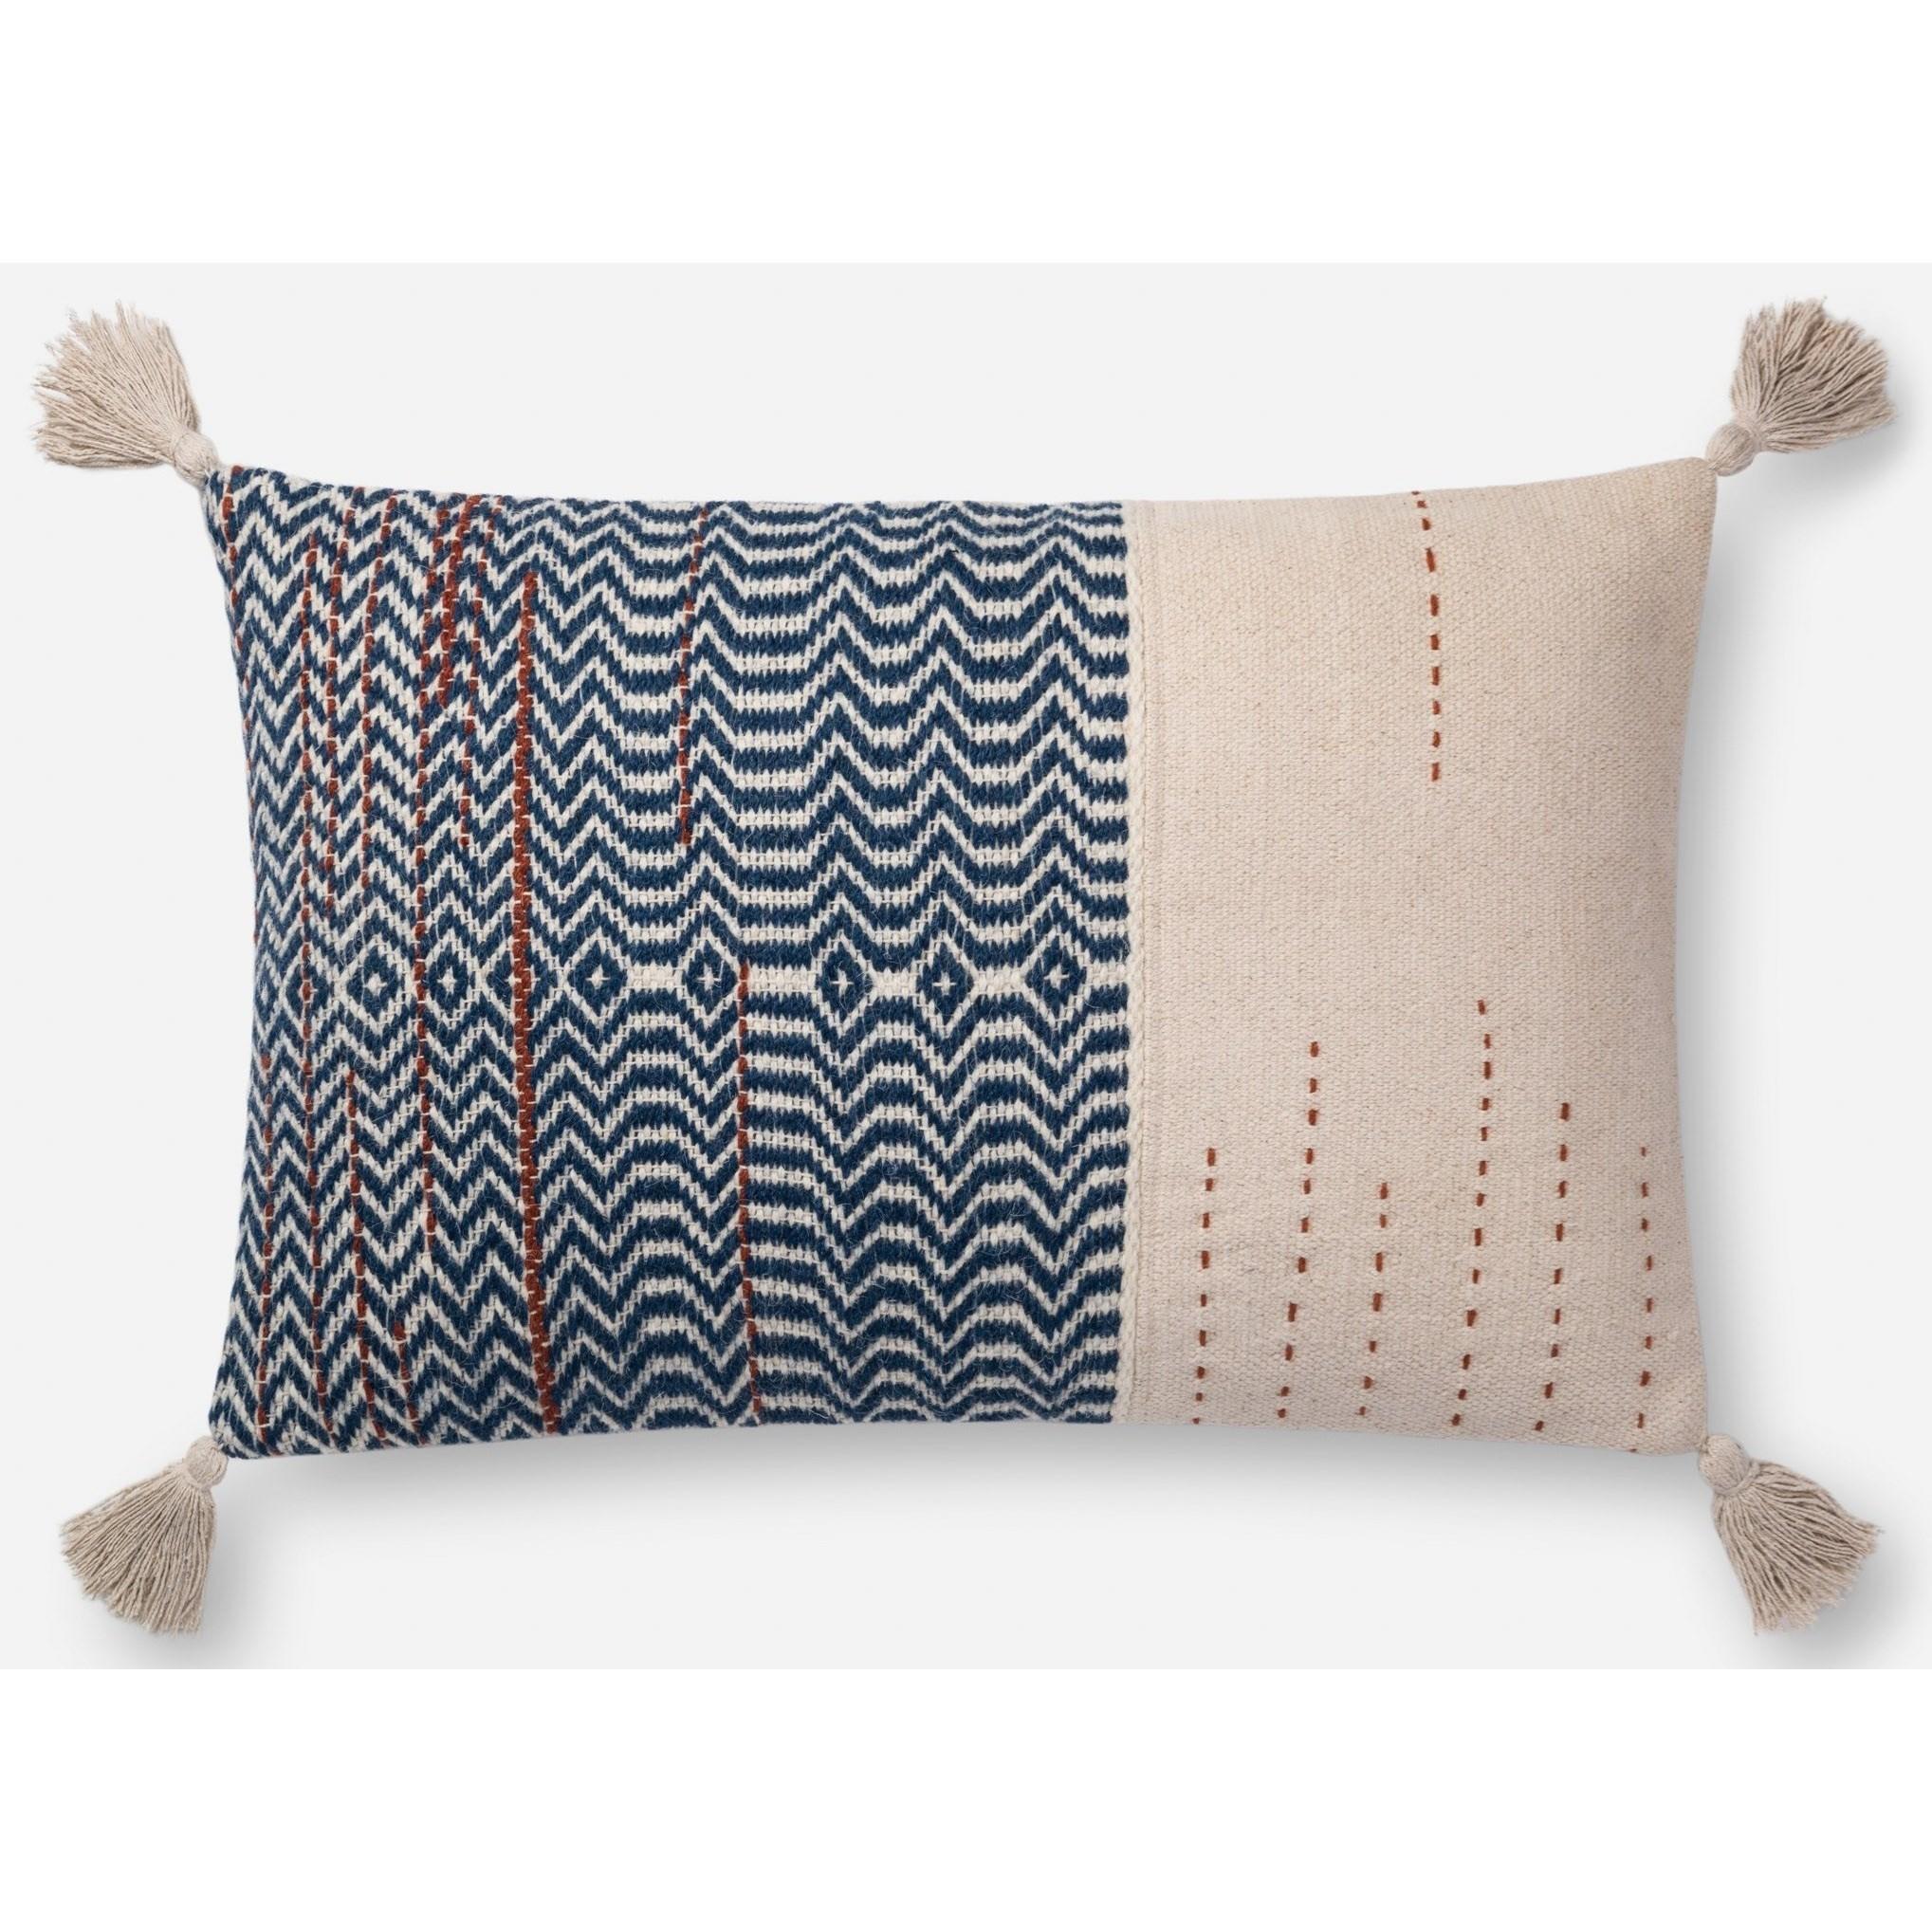 "16"" x 26"" Polyester Pillow"